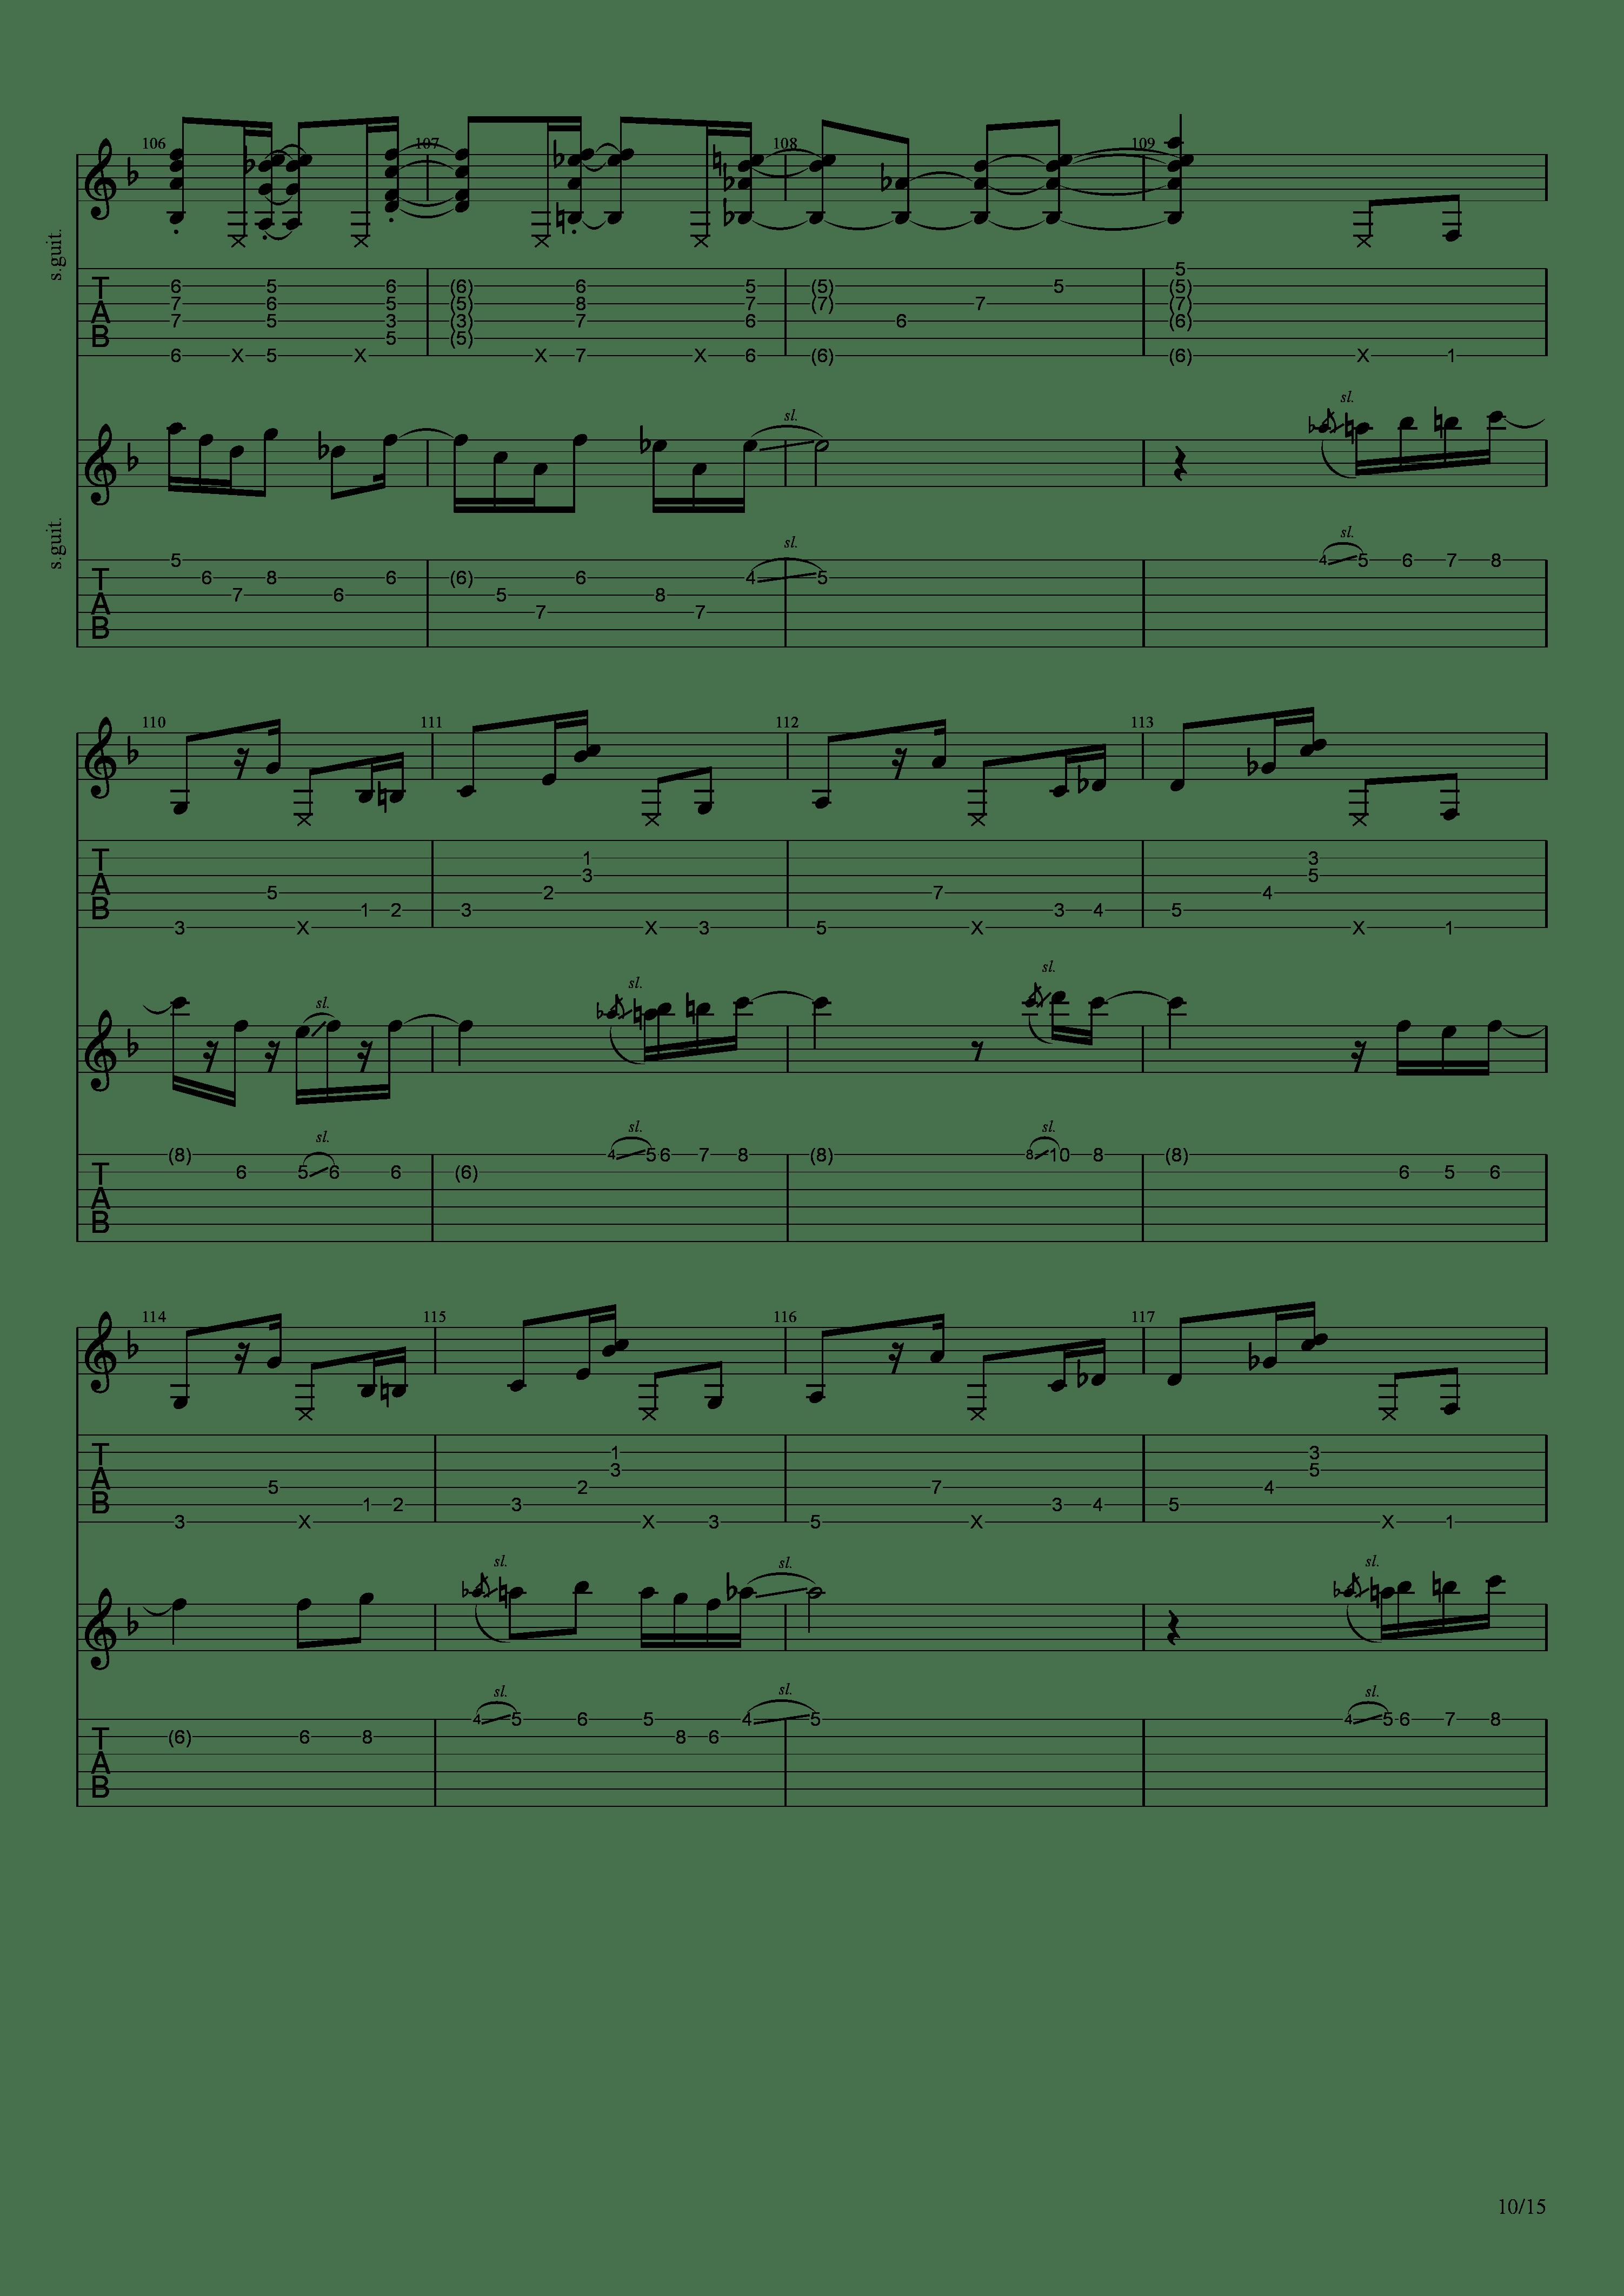 Labyrinth (松井佑贵&井草圣二)吉他谱10